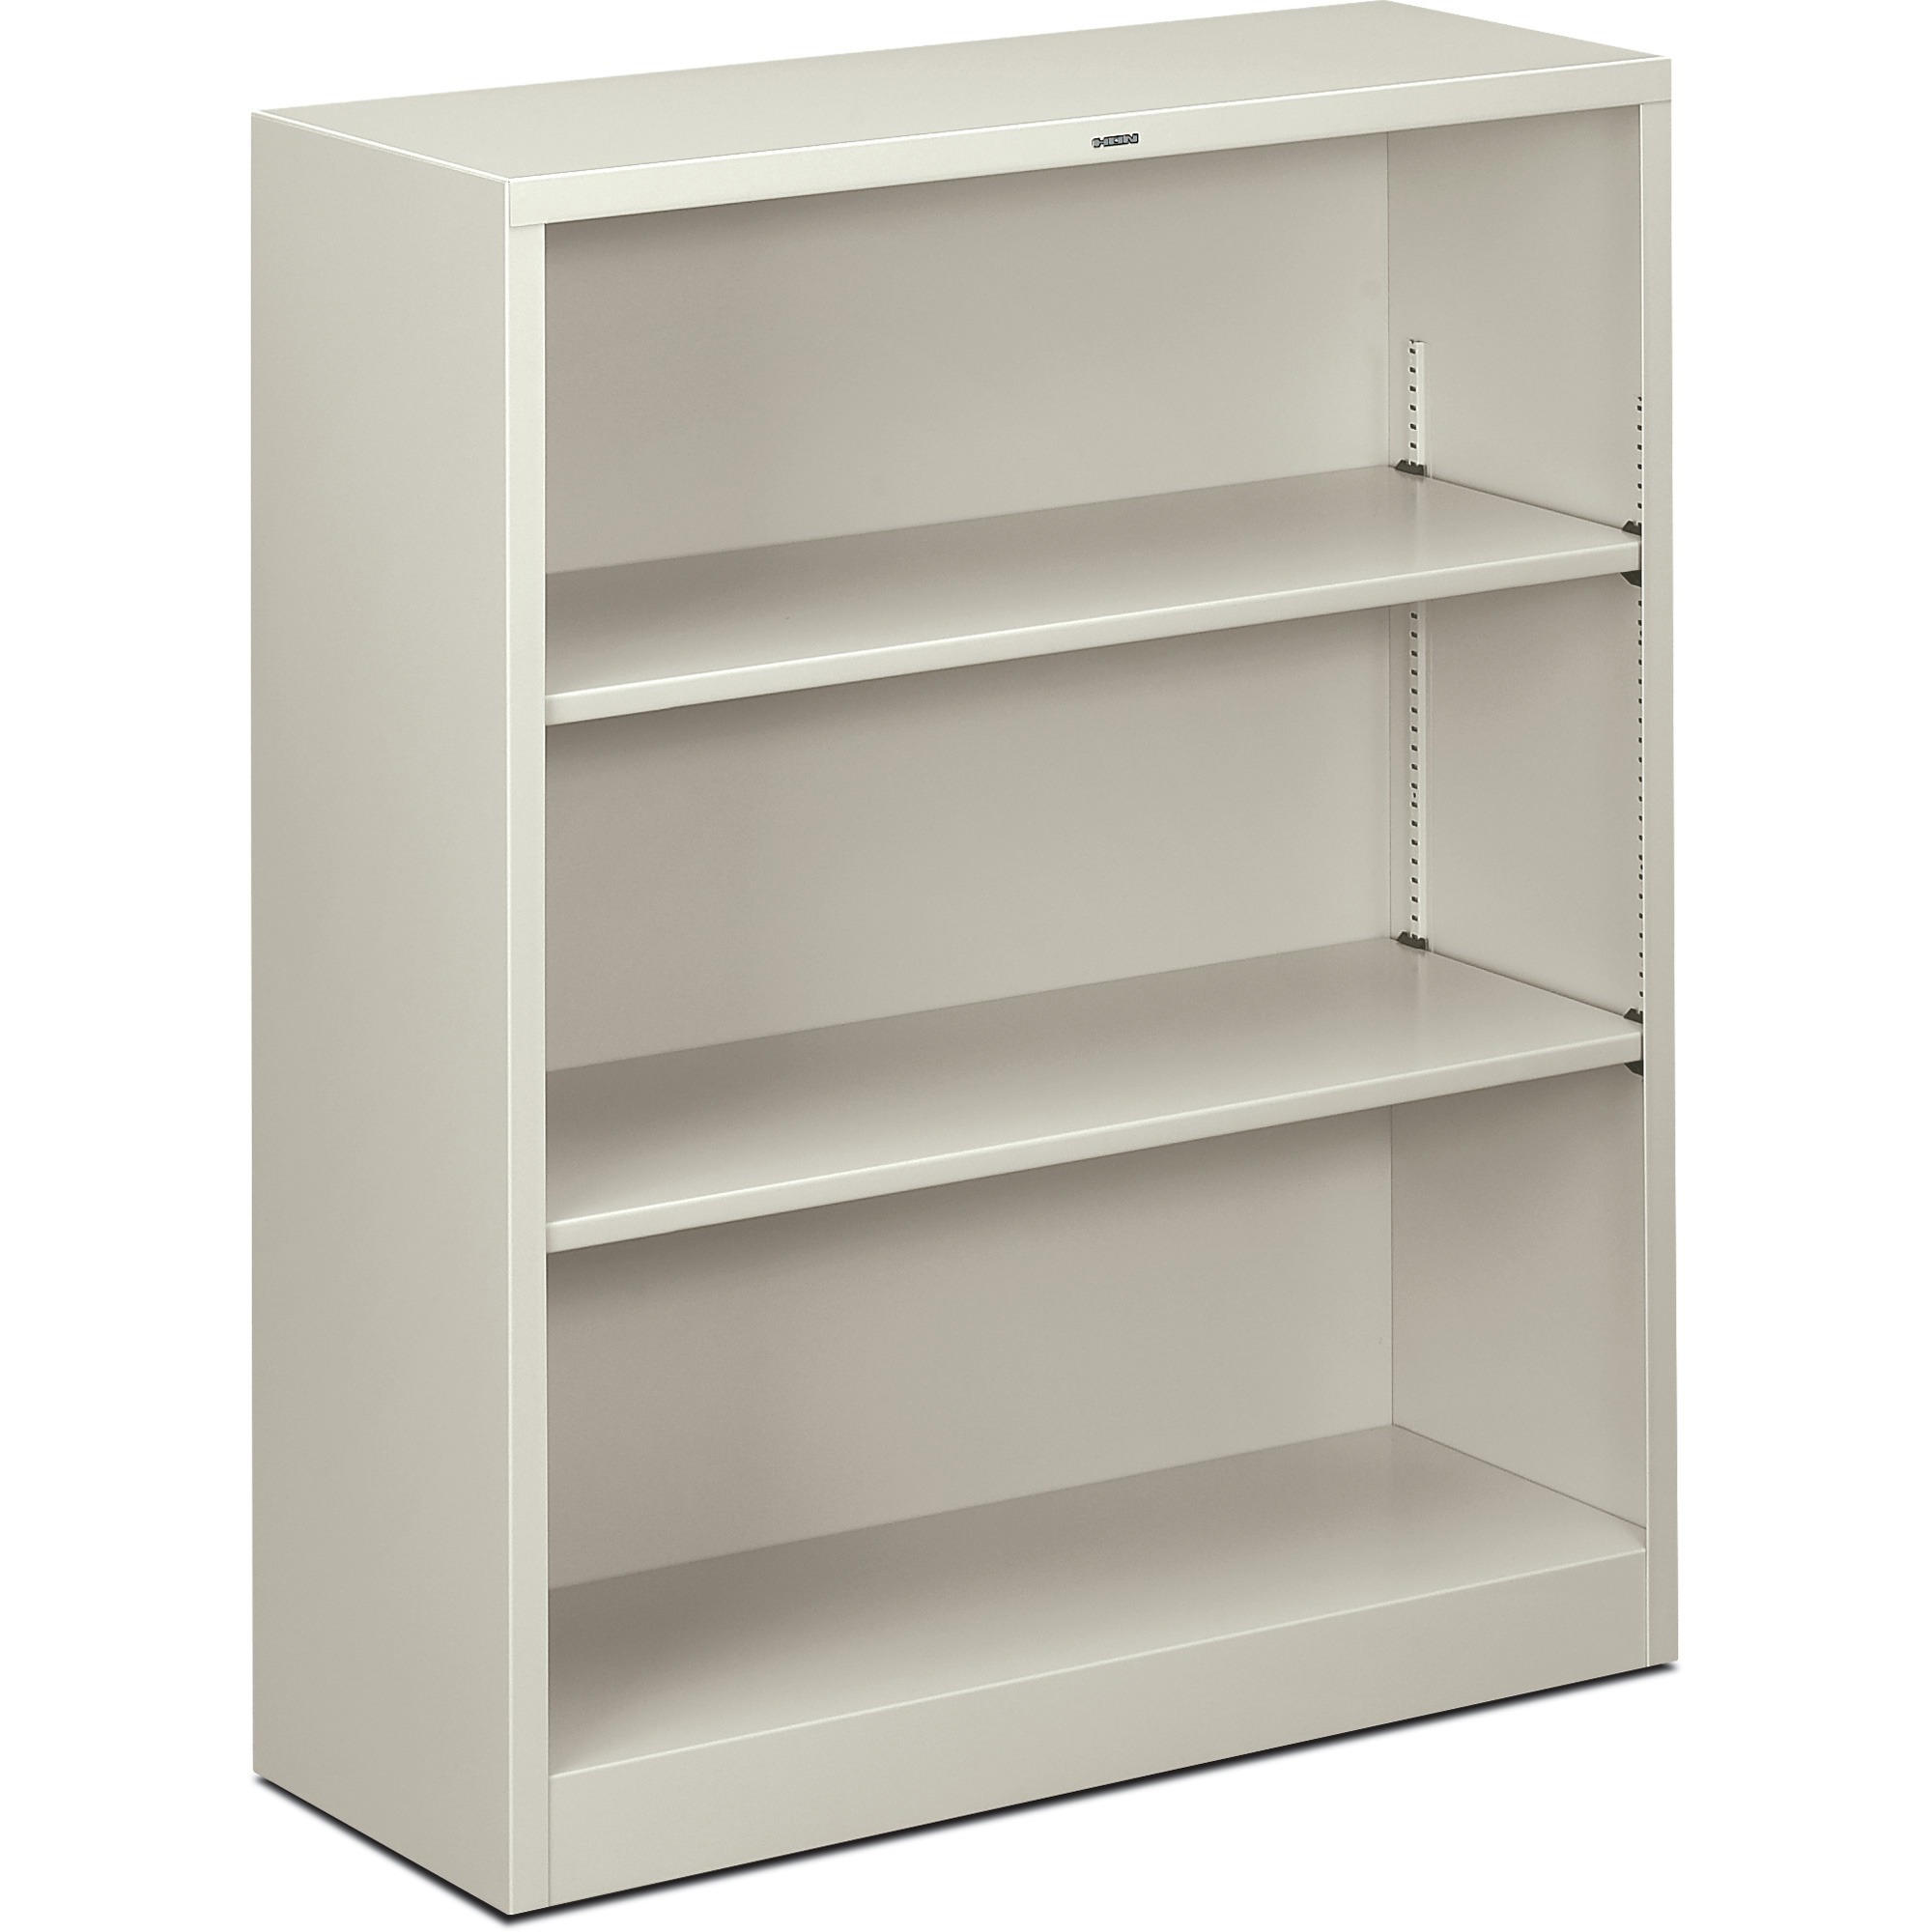 antique bookcase barritt furniture wood hon metal products black industrial bookcases coaster las vegas online